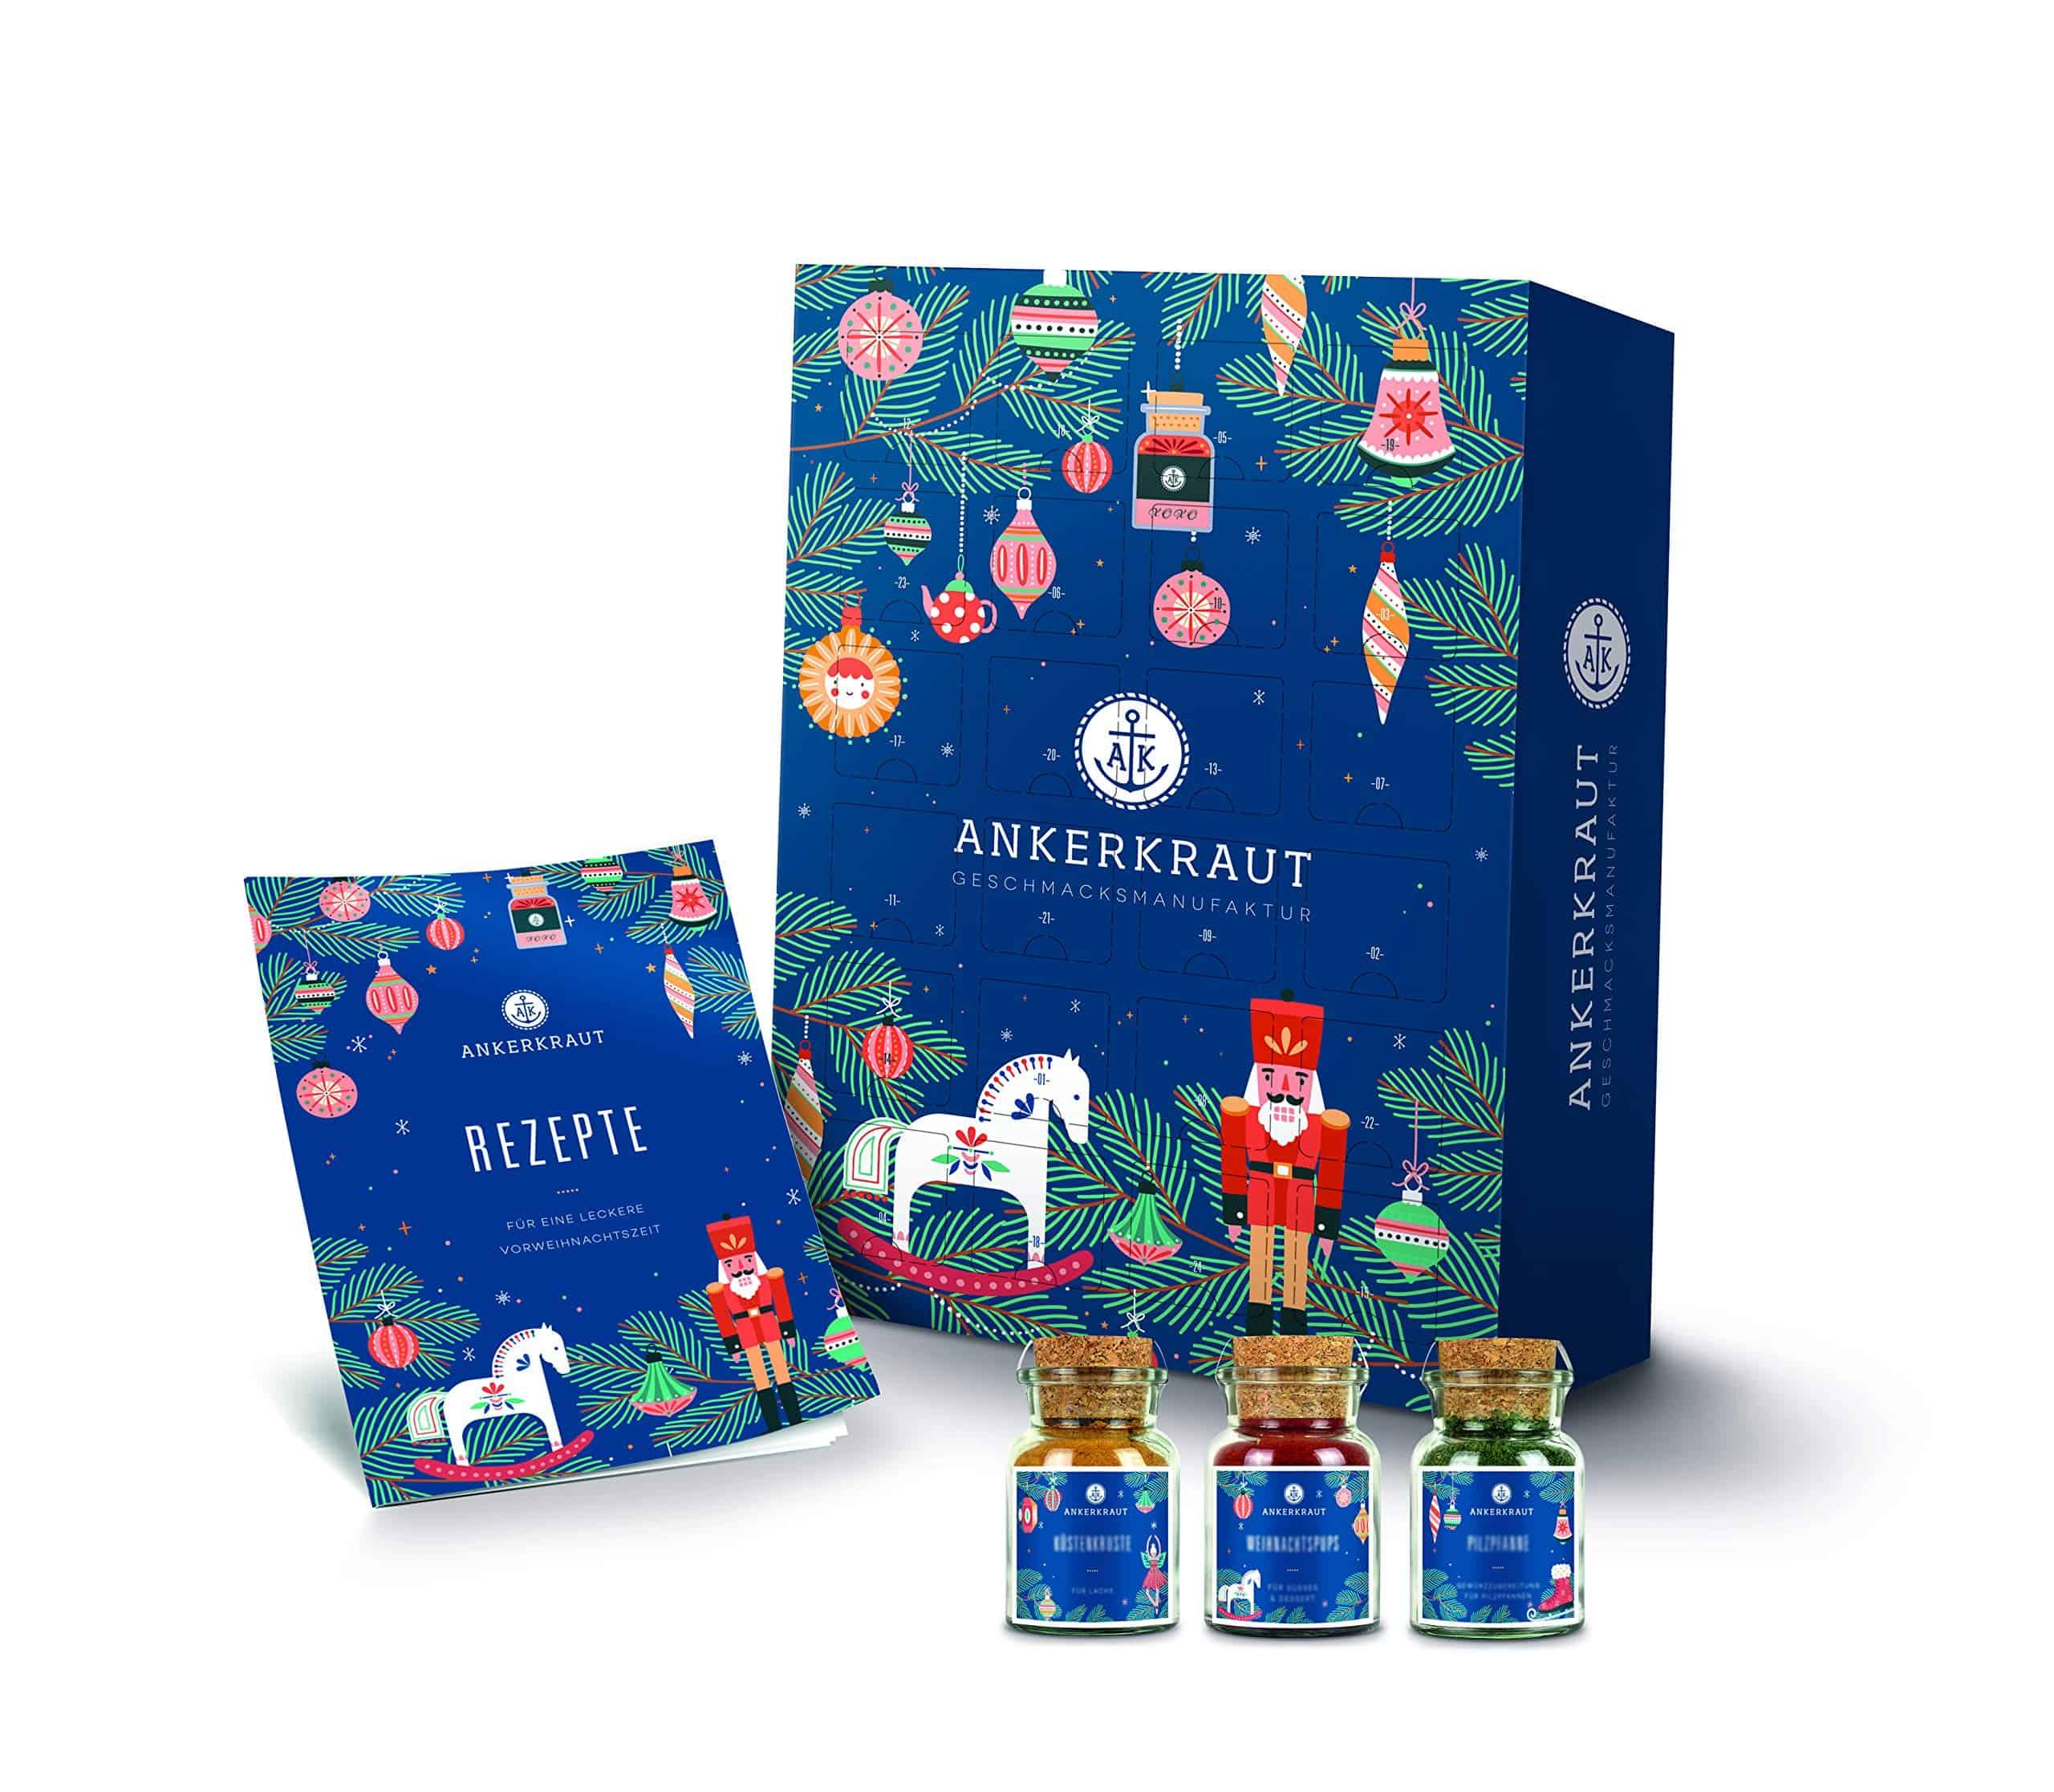 Ankerkraut Premium Adventskalender 2020